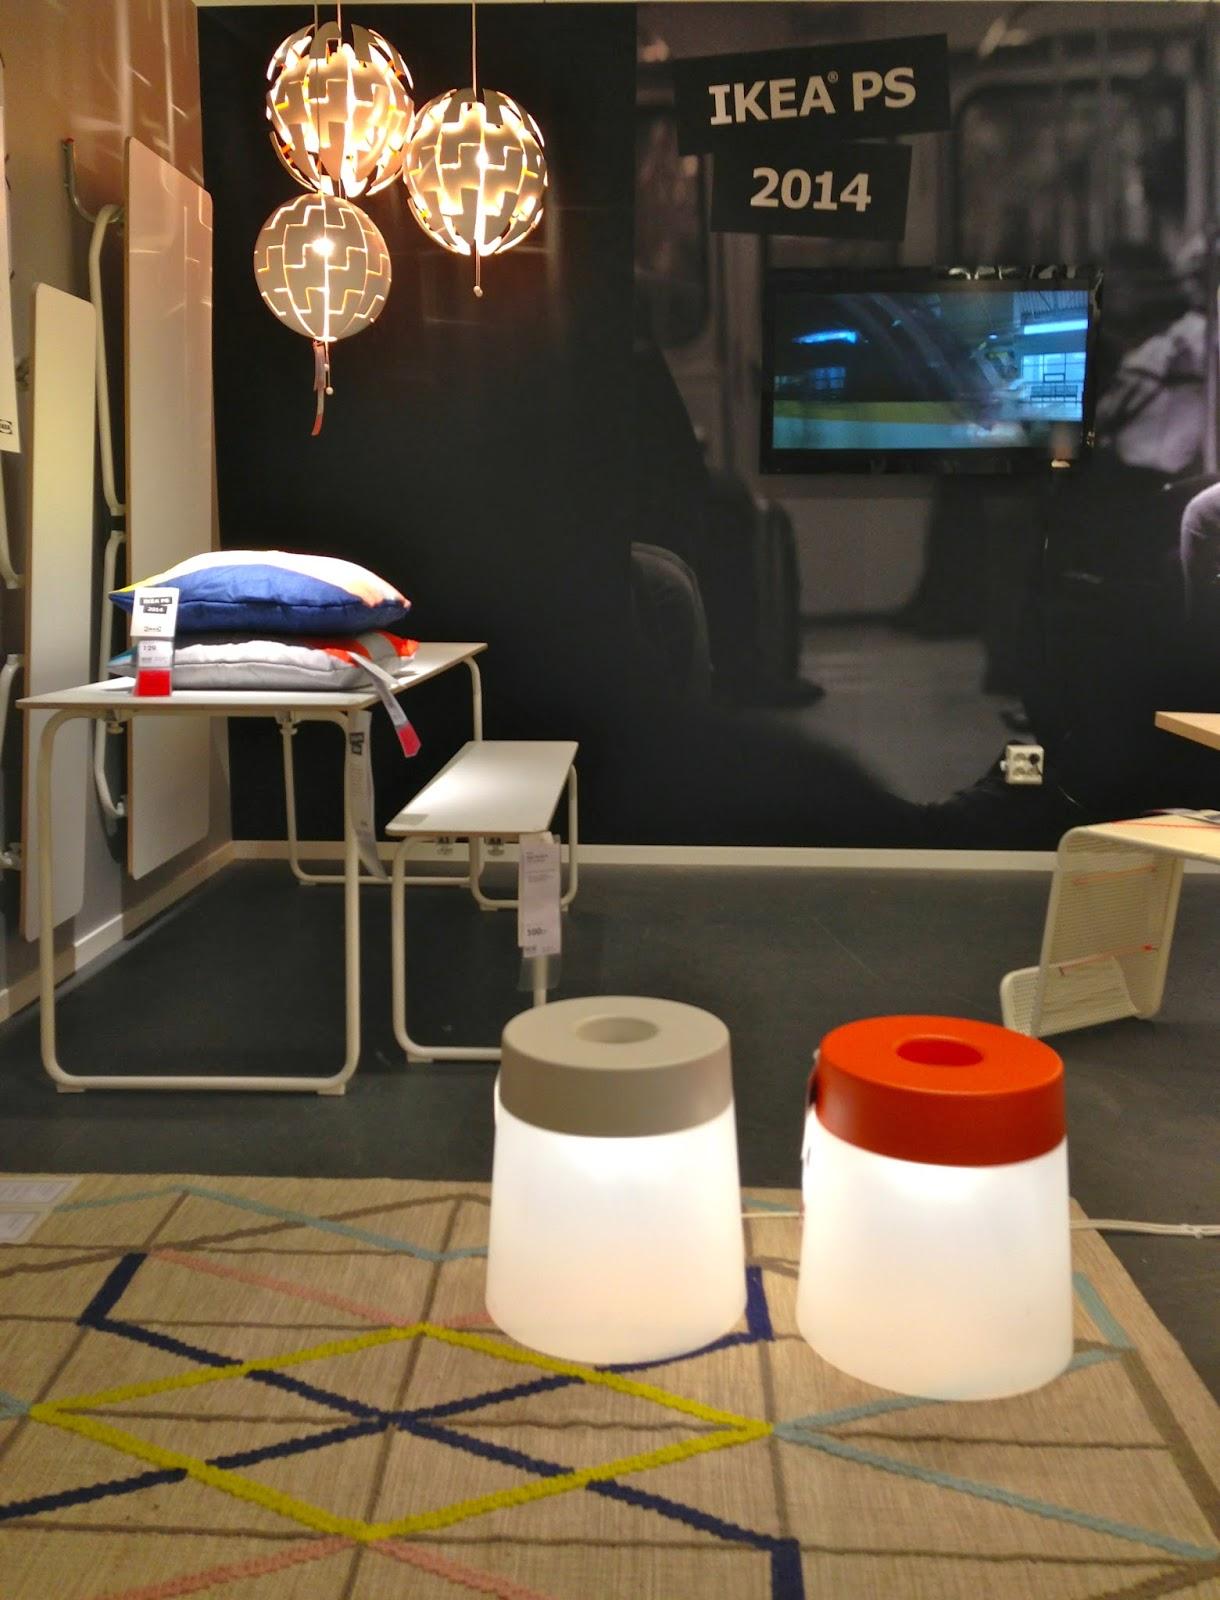 kreativa kvadrat ab ikea ps 2014 s ljstart p ikea j nk ping idag. Black Bedroom Furniture Sets. Home Design Ideas